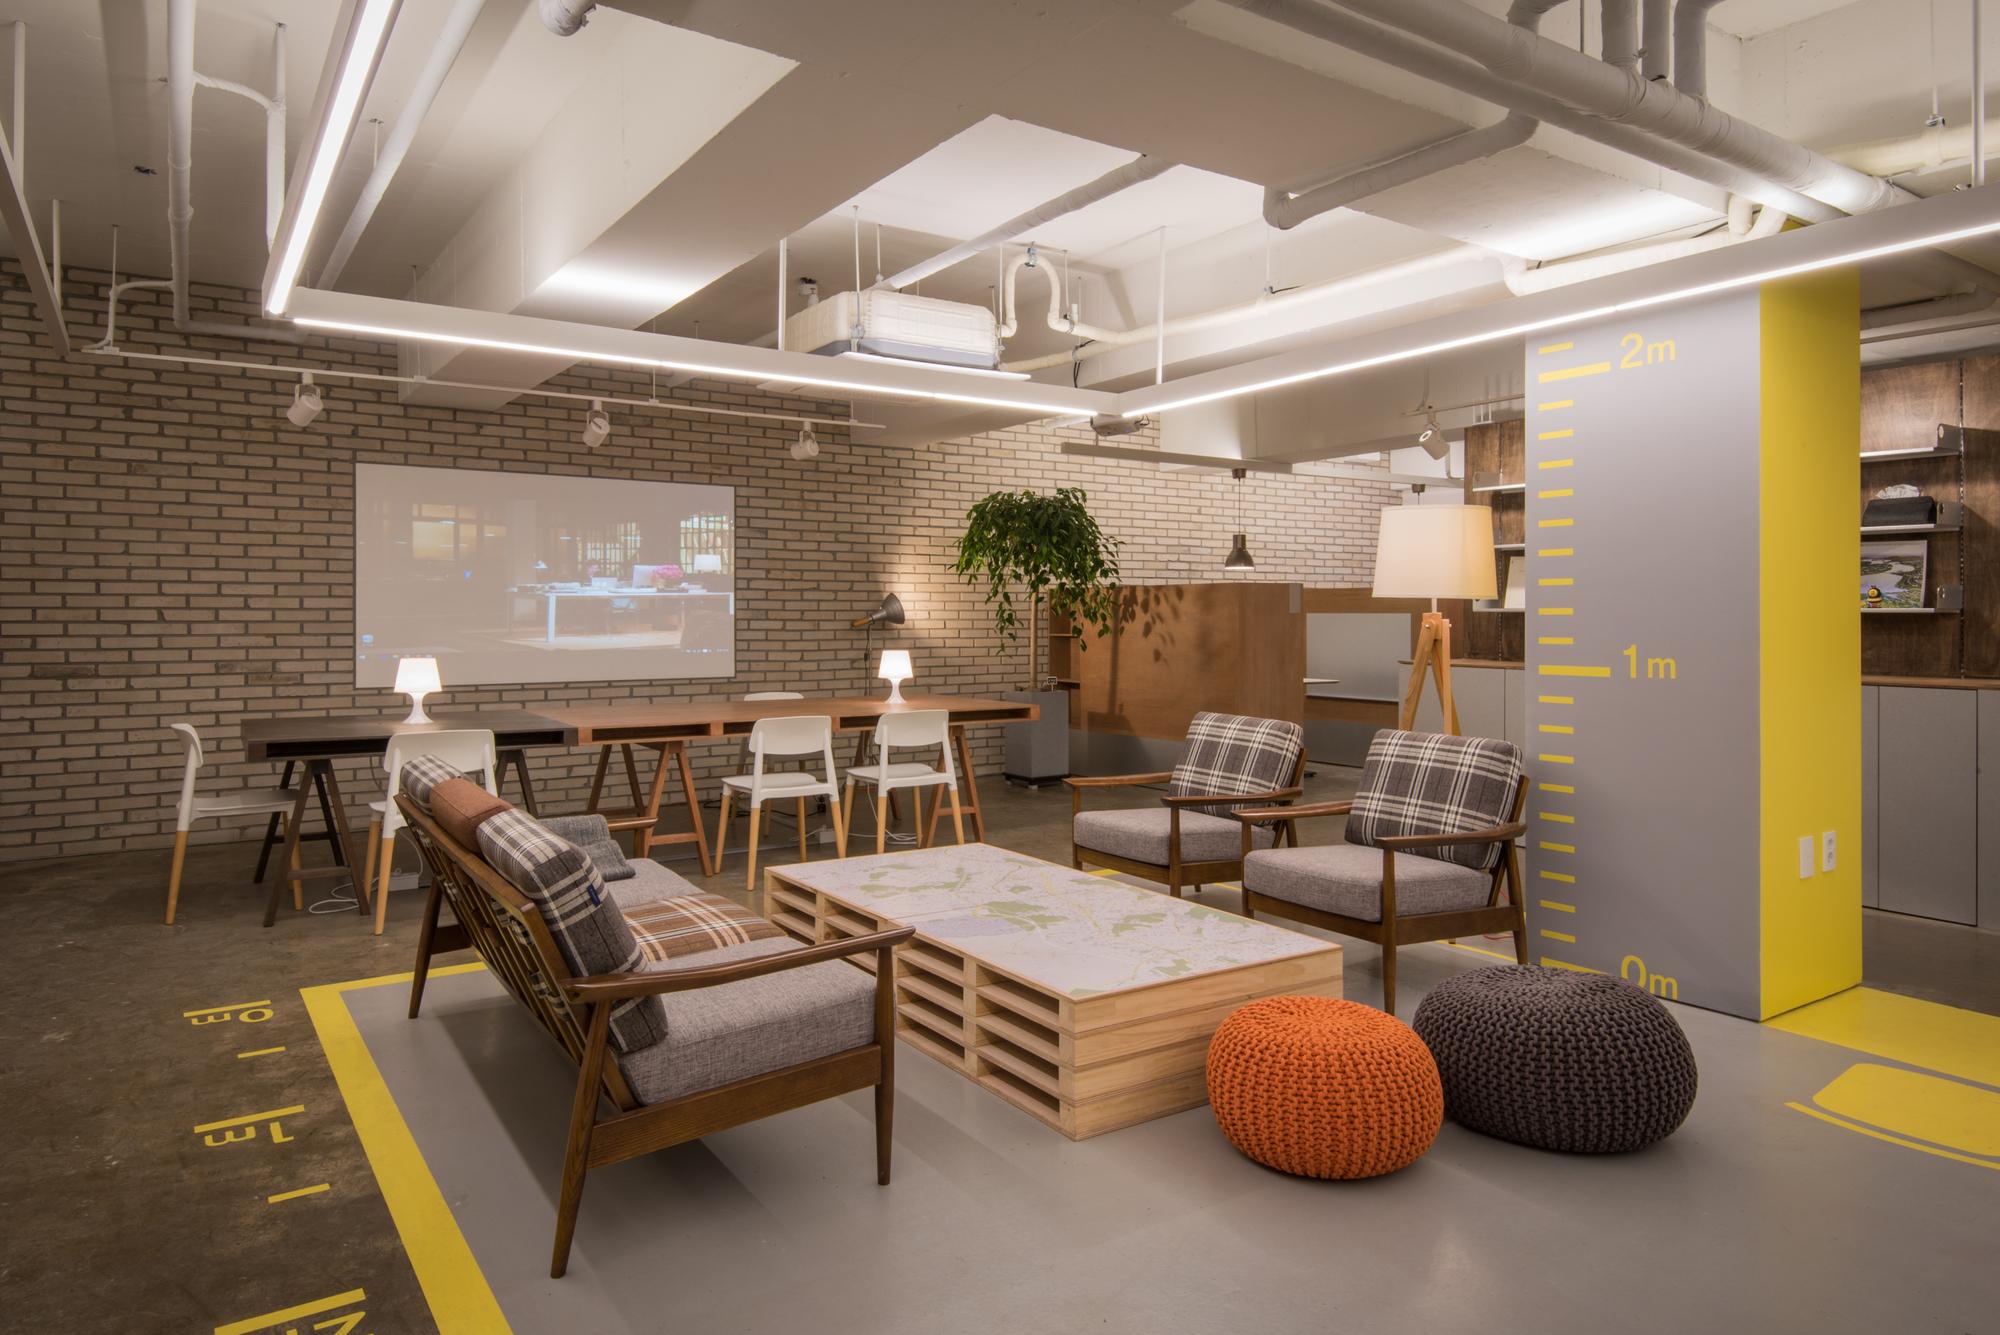 Galer A De Mr Homes Design Studio Intu Ne 10